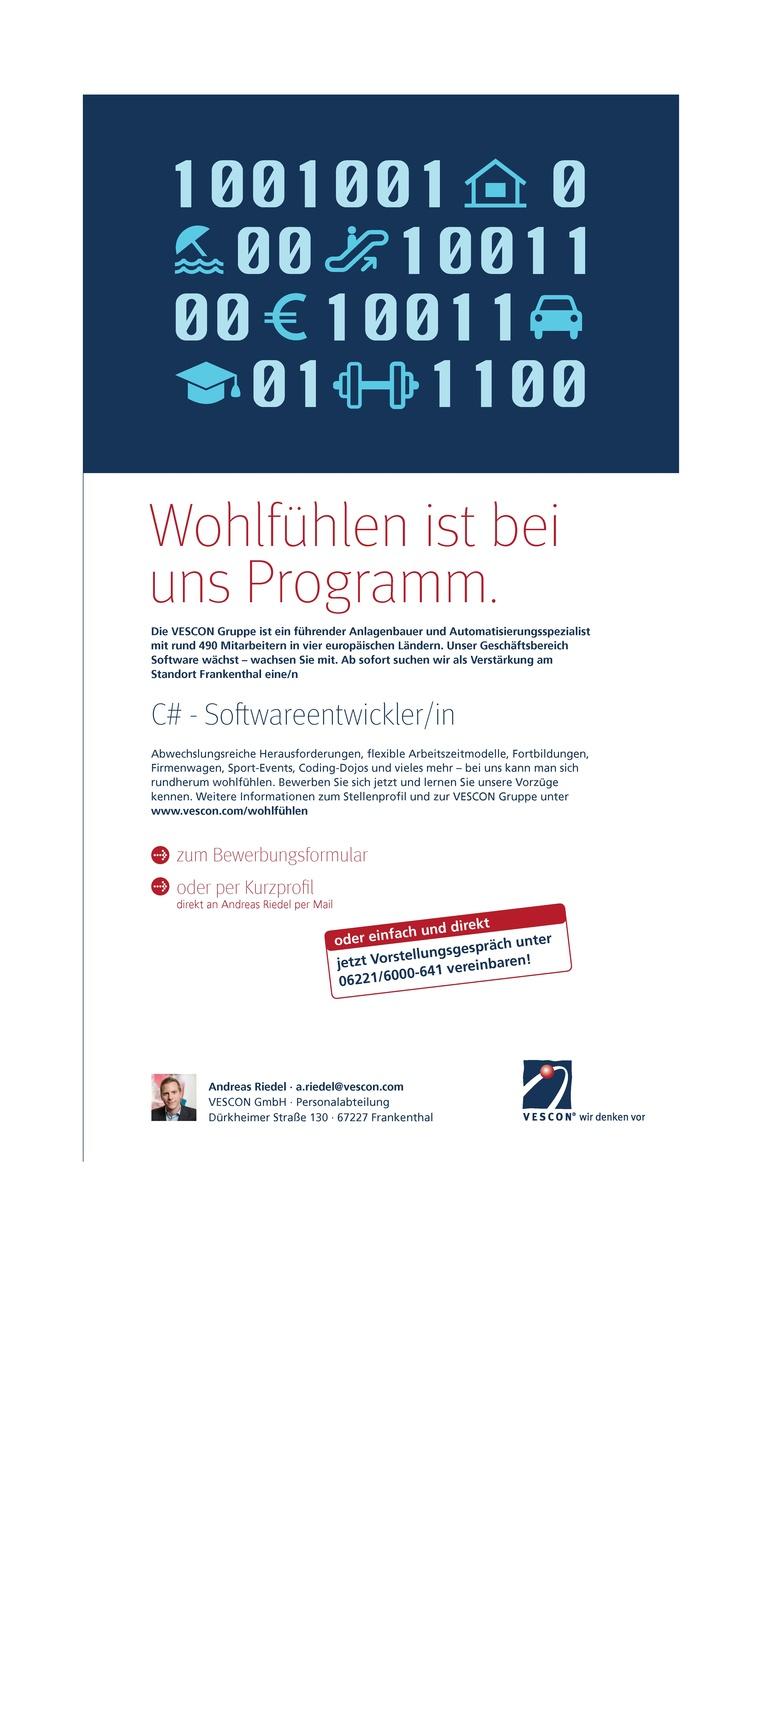 C# Softwareentwickler (m/w)